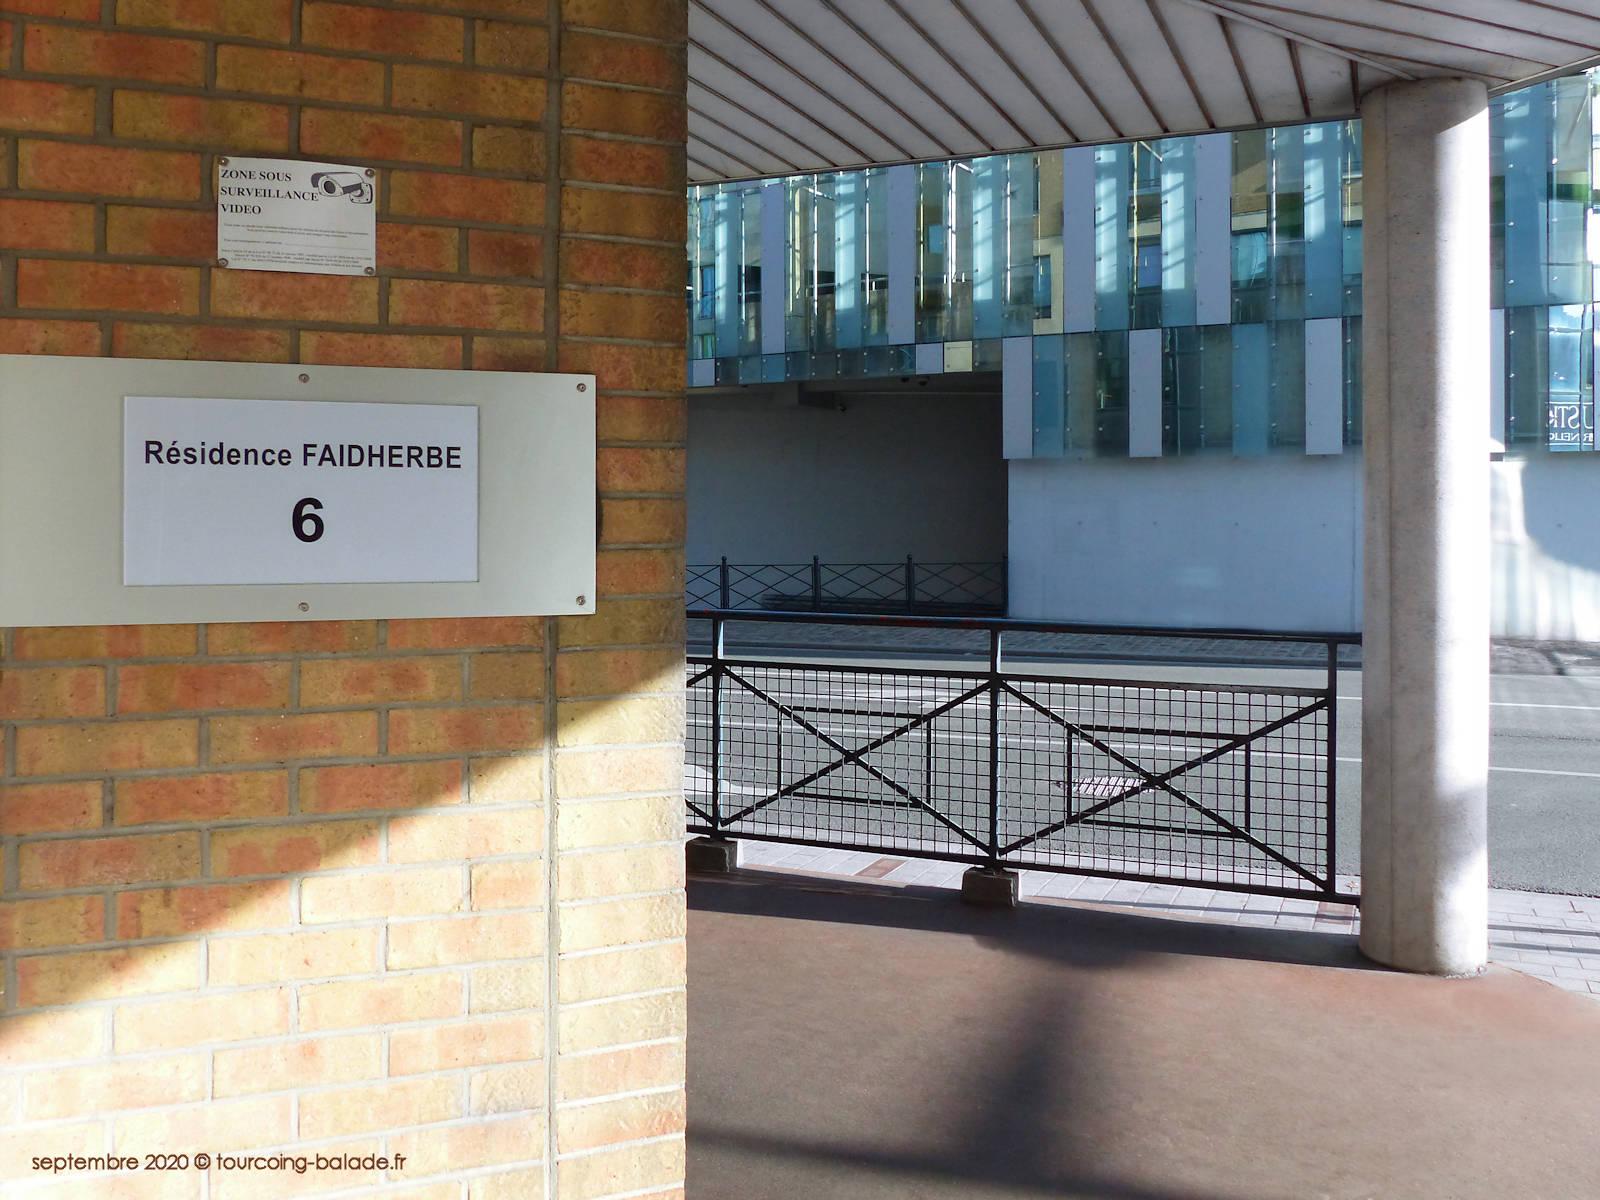 Entrée Résidence Faidherbe, Tourcoing 2020